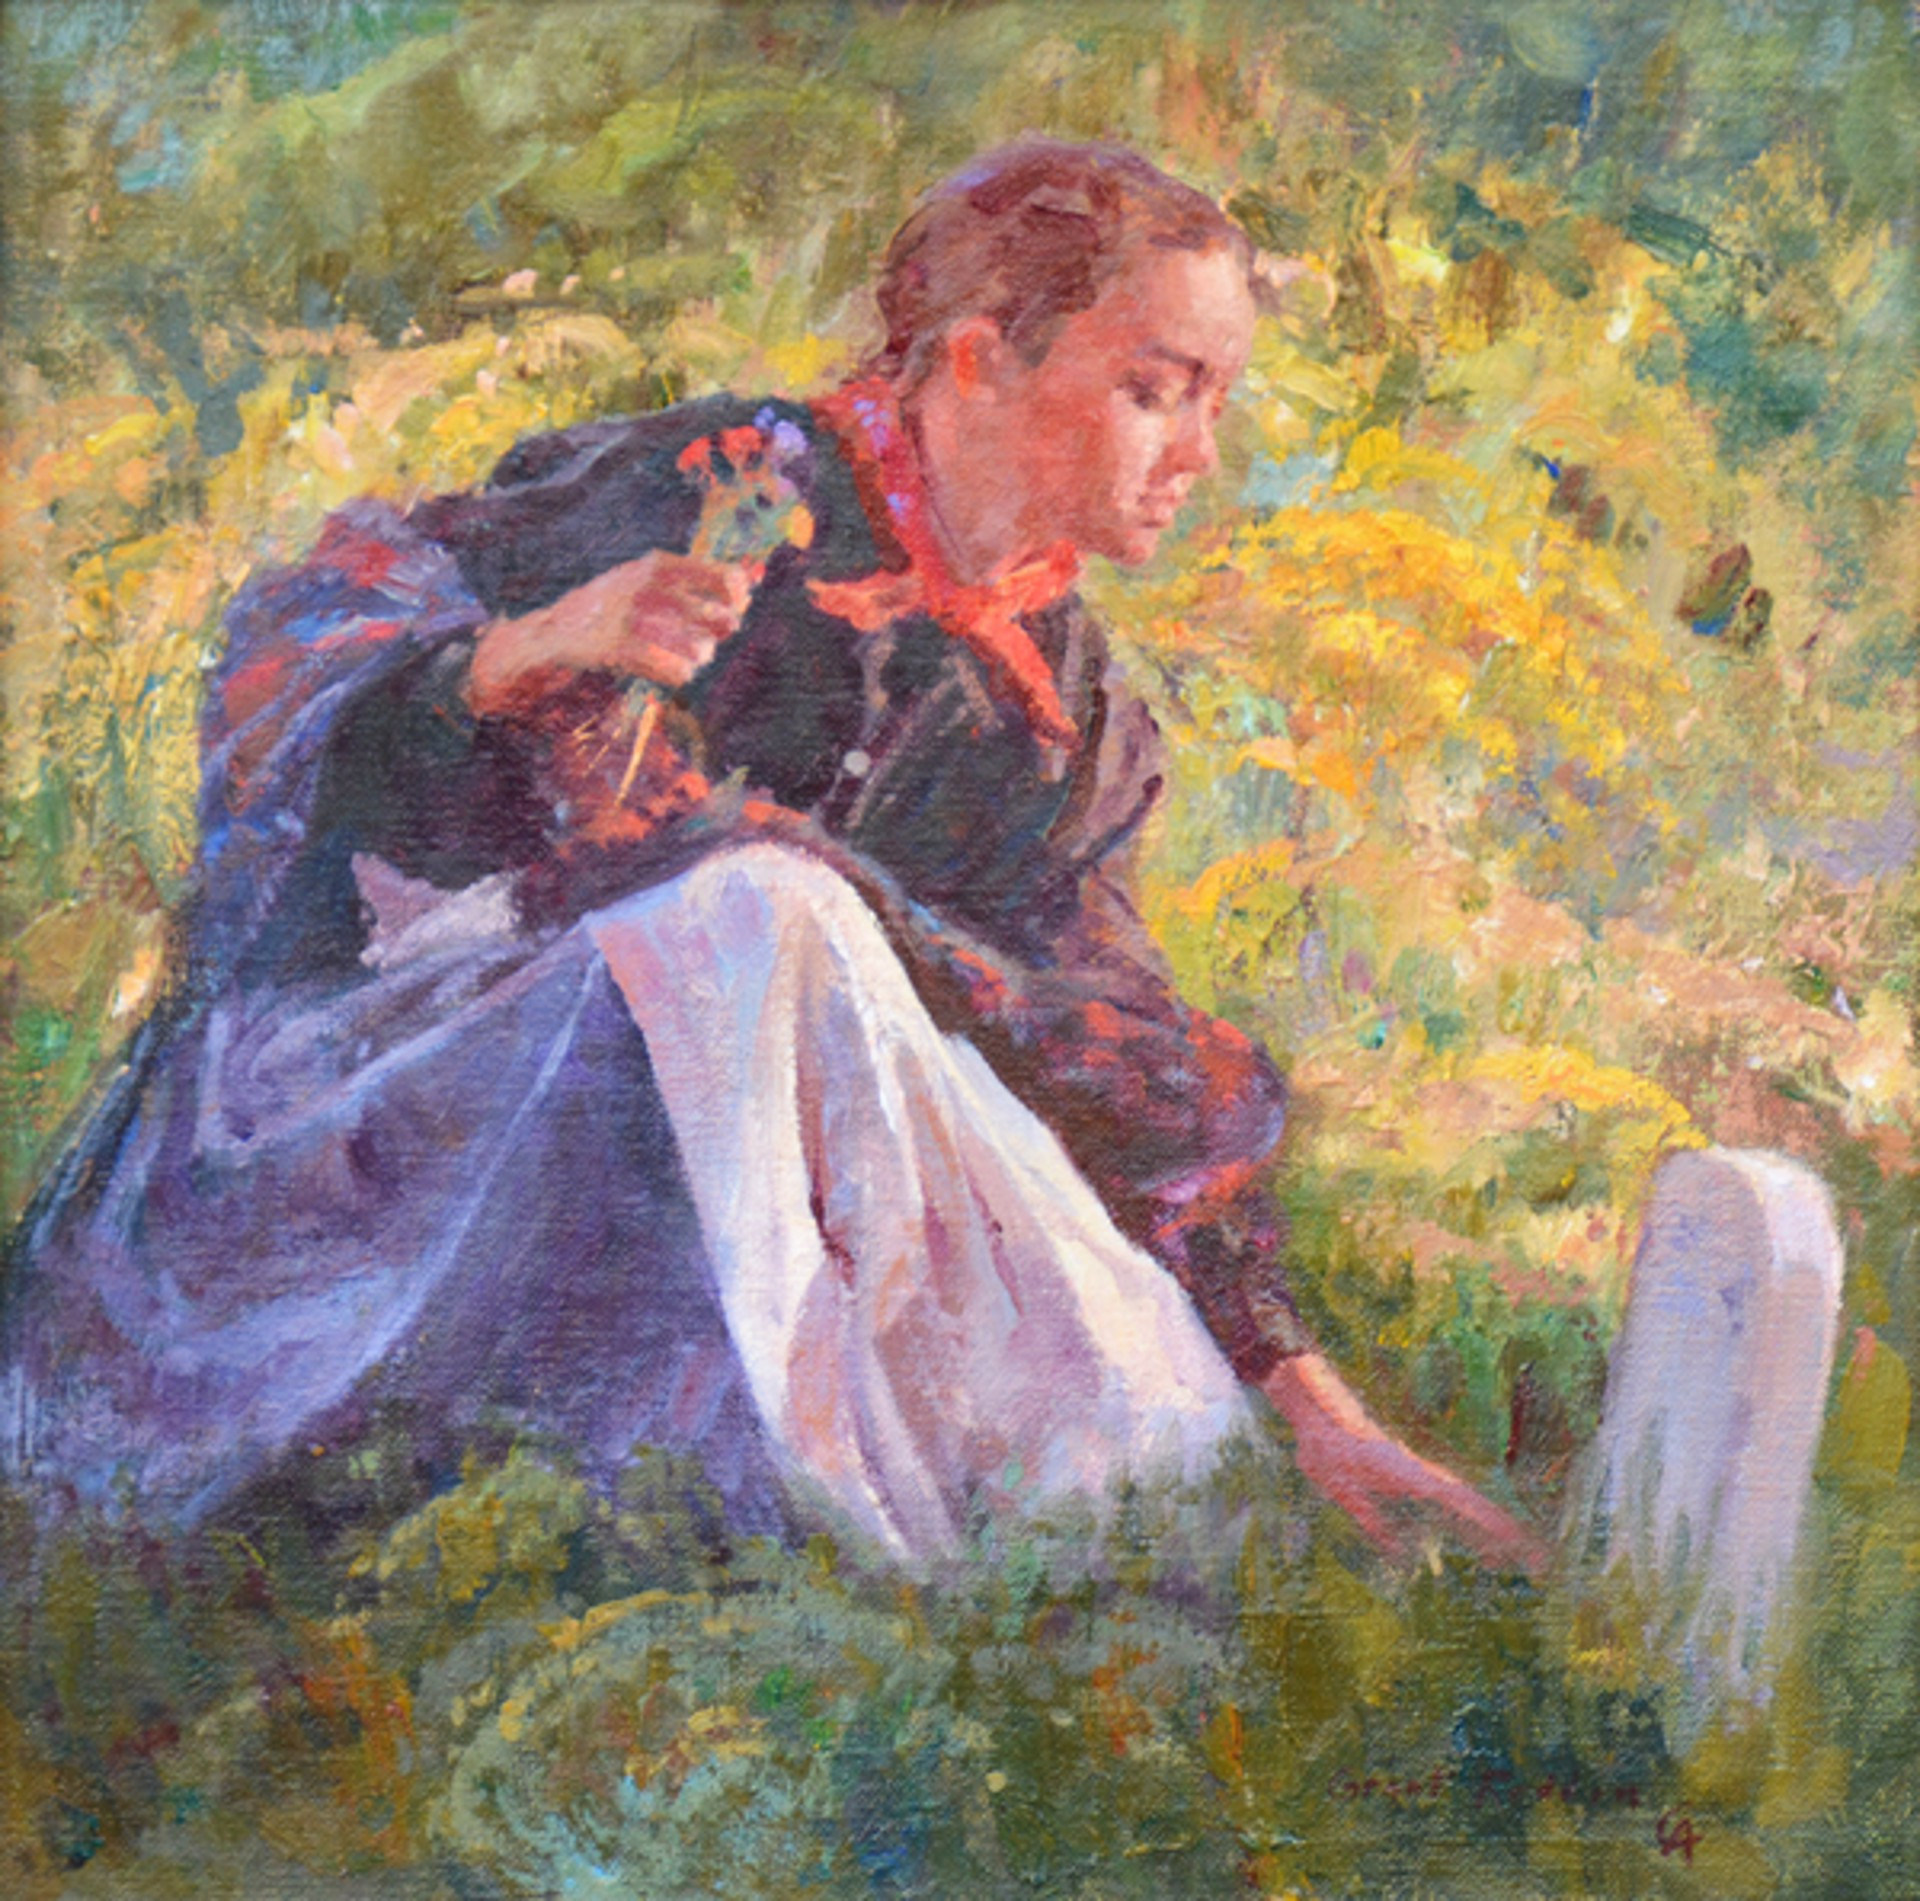 Pioneer Girl by Grant Redden